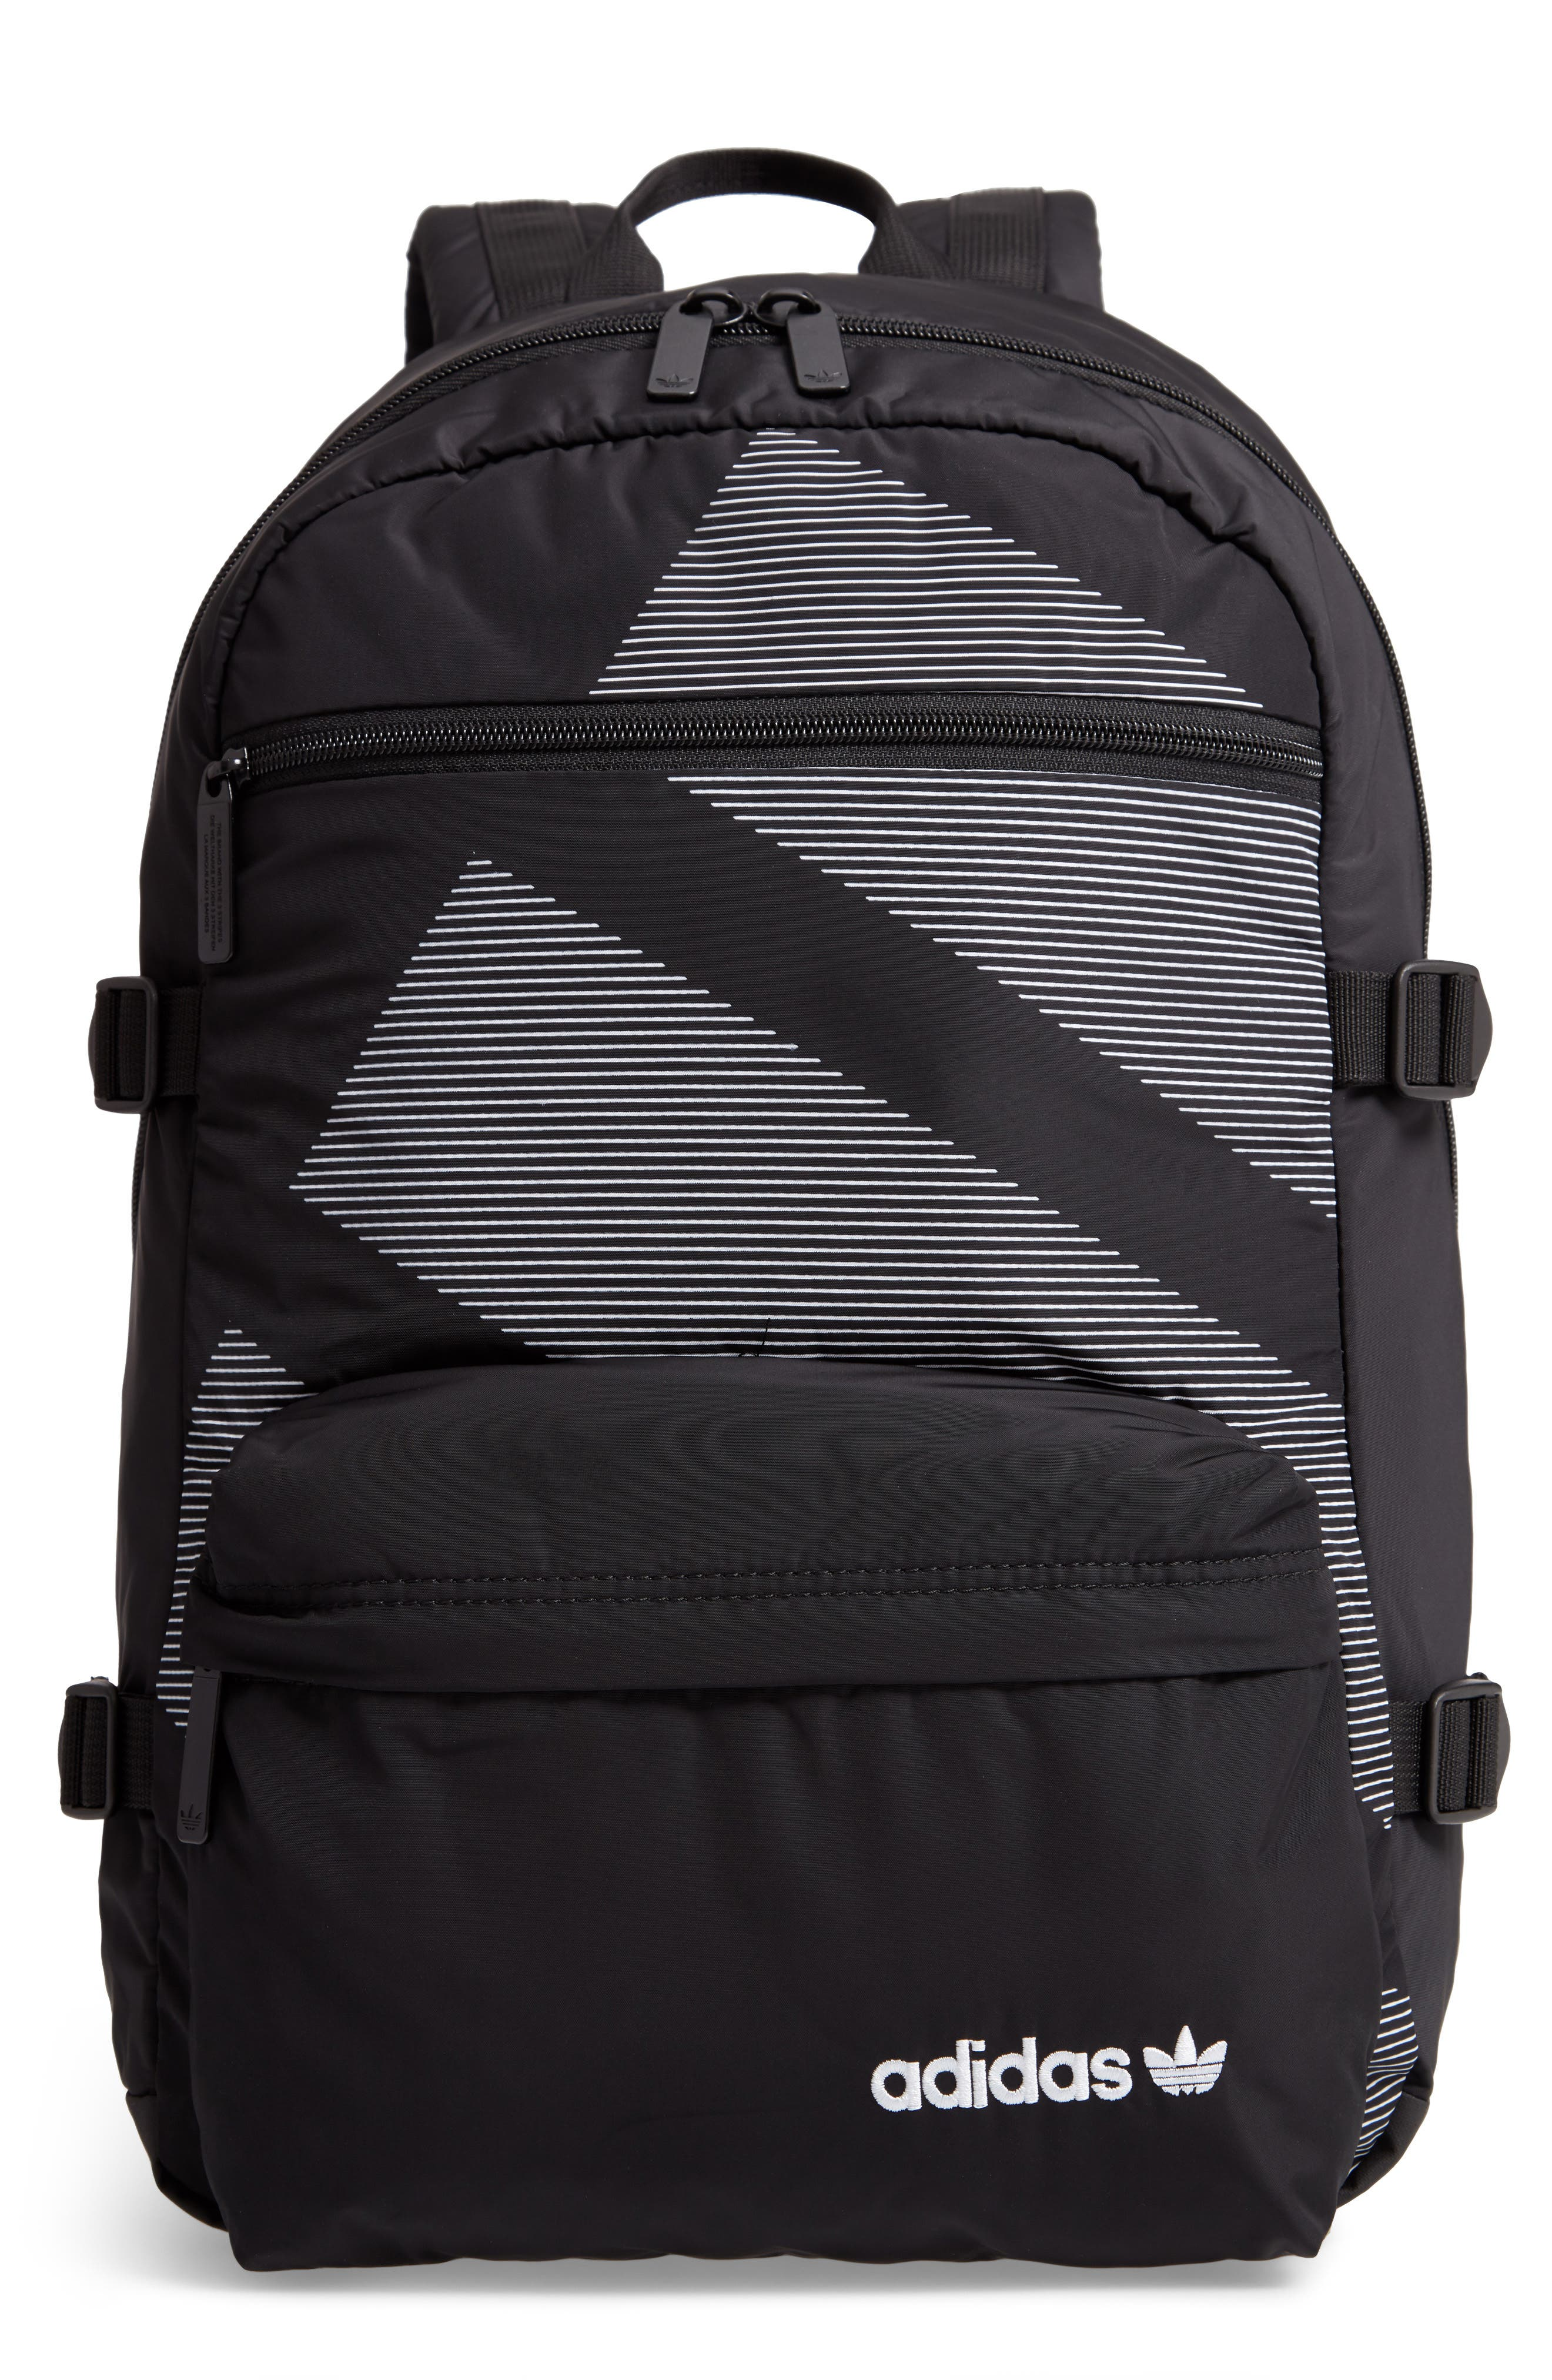 ADIDAS ORIGINALS, EQT Backpack, Main thumbnail 1, color, BLACK/ WHITE/ SUB GREEN